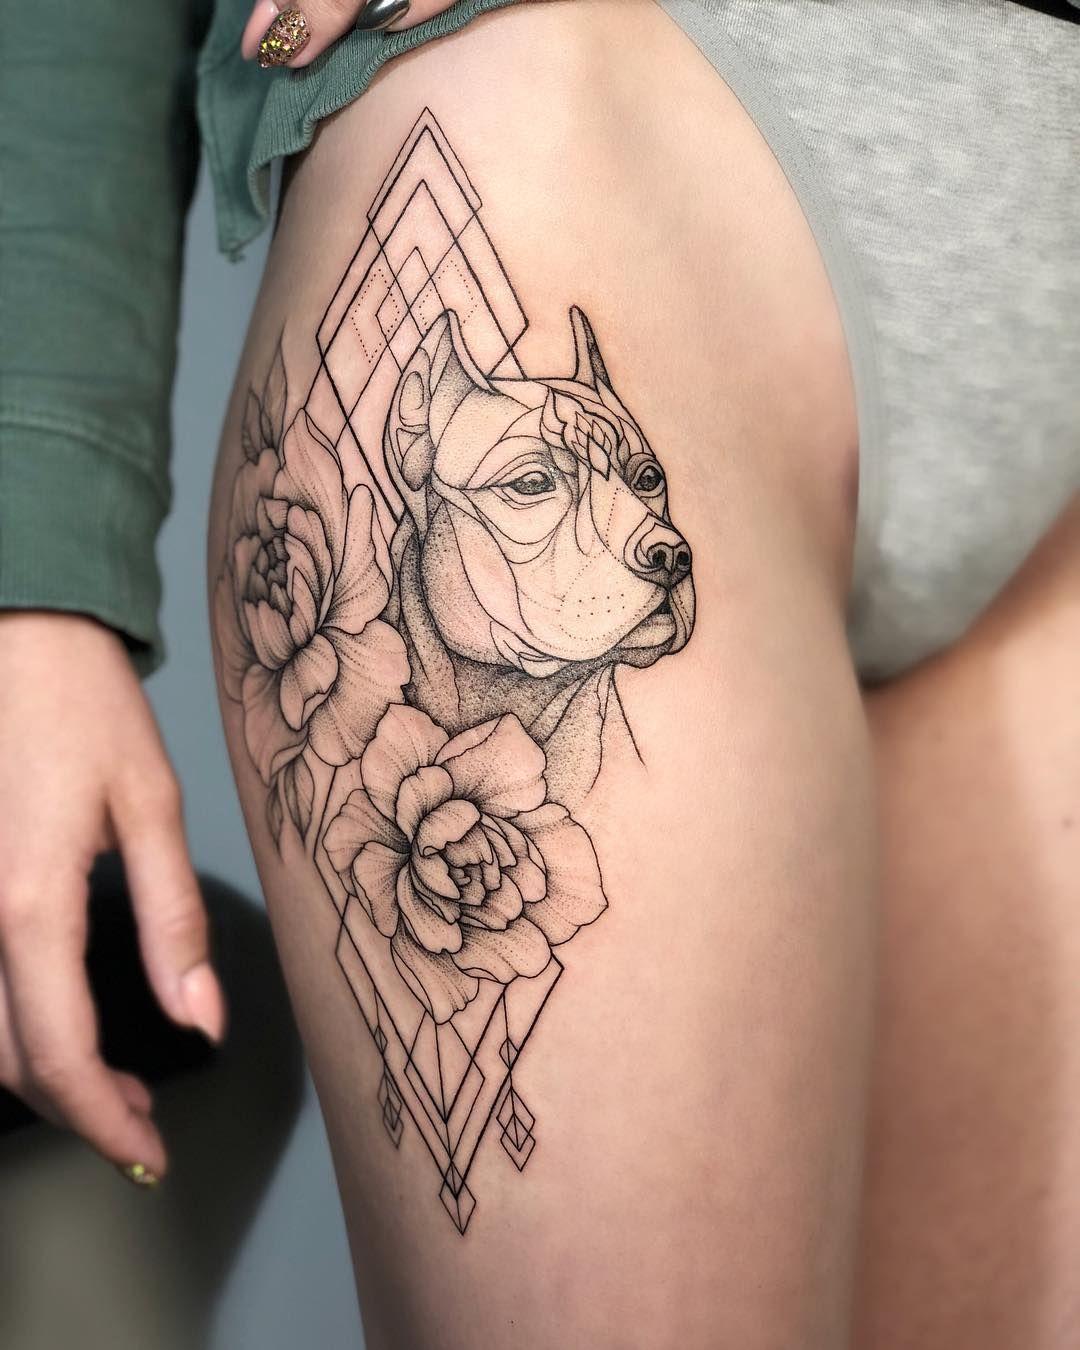 Tattoo Irainkers Linework Dotwork Geometry Animaltattoo Dog Animal Tattoos For Women Dog Tattoos Thigh Tattoos Women